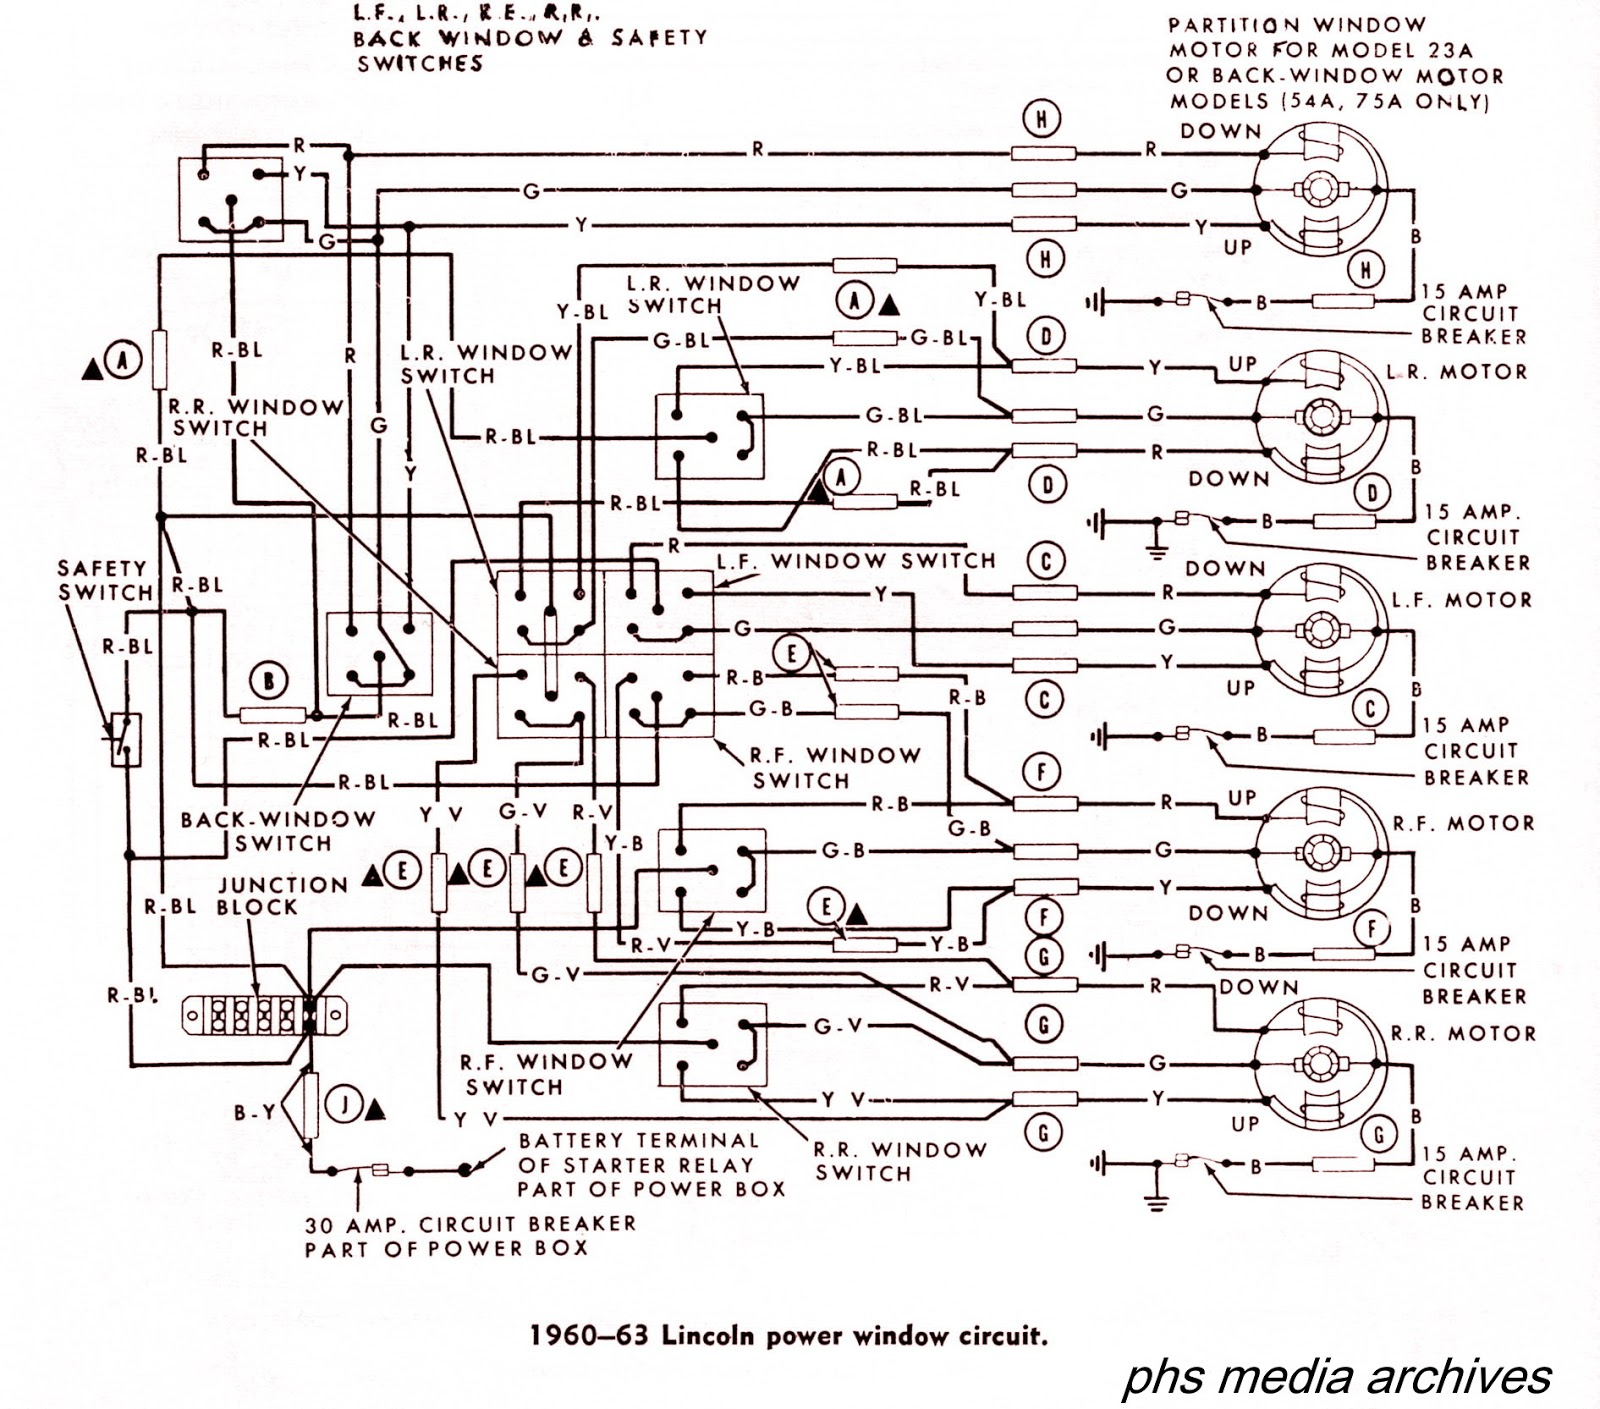 Tech Series: 19601964 Lincoln Wiring Diagrams